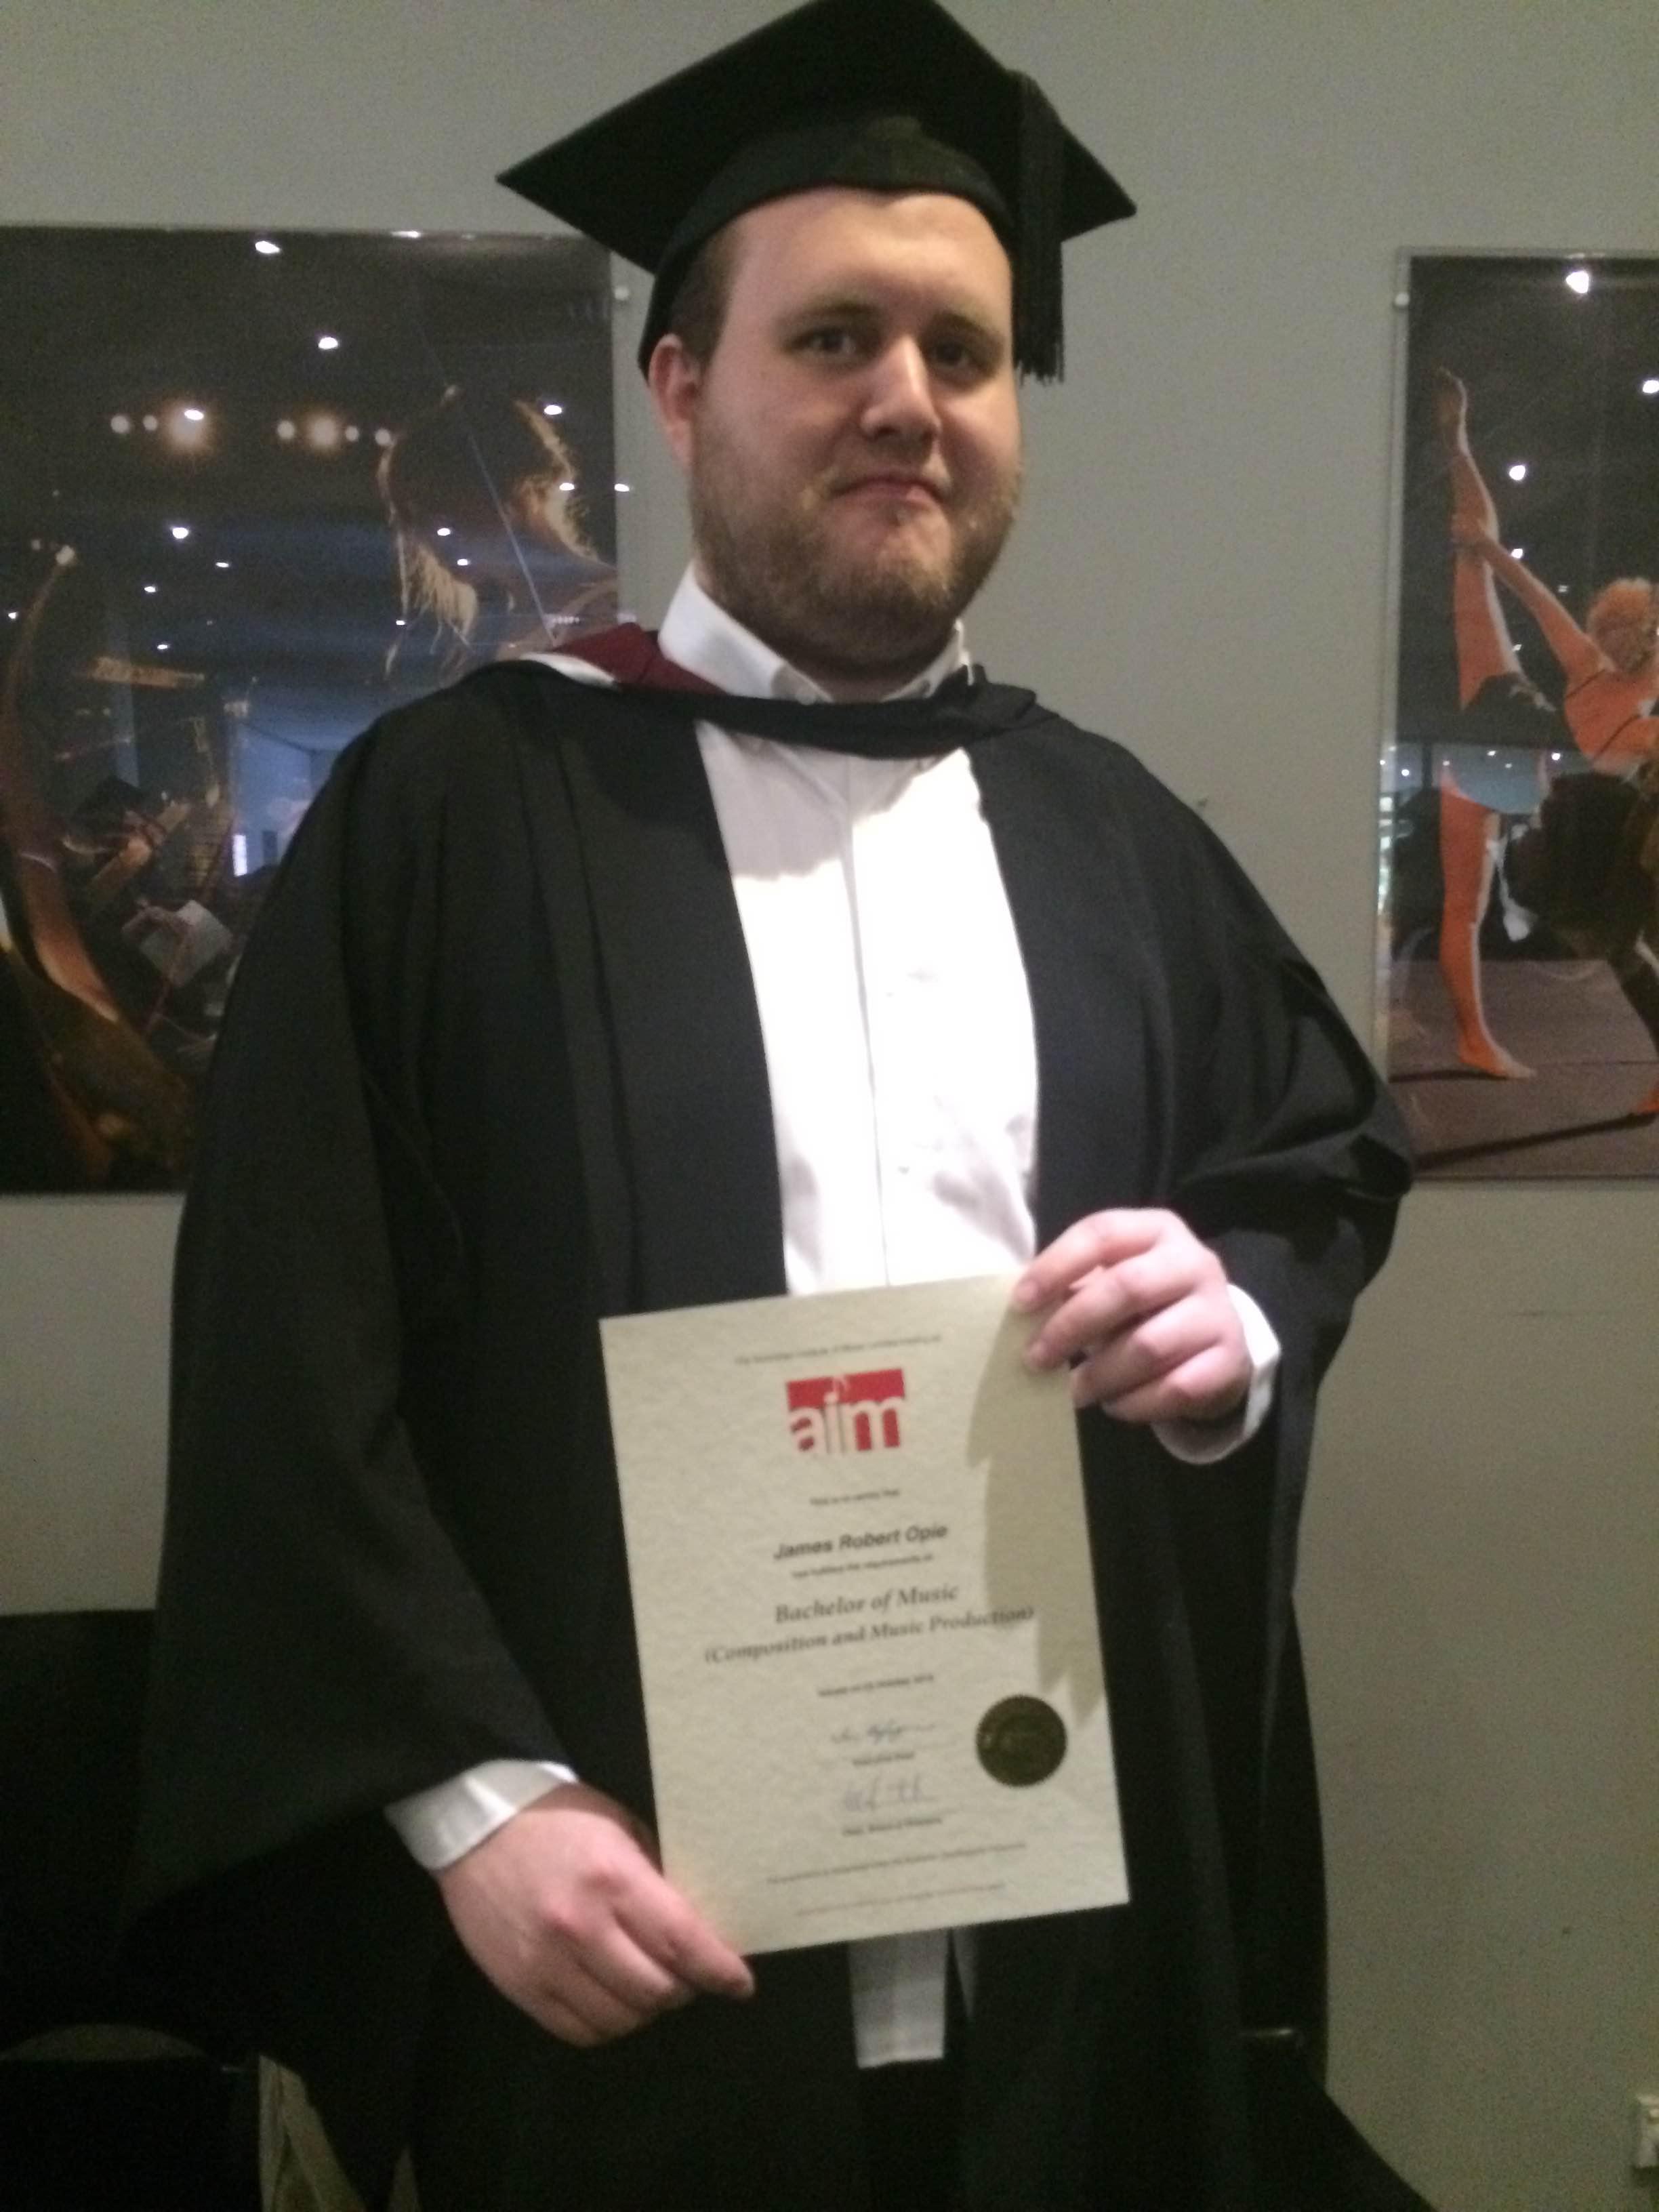 My Bachelor Degree